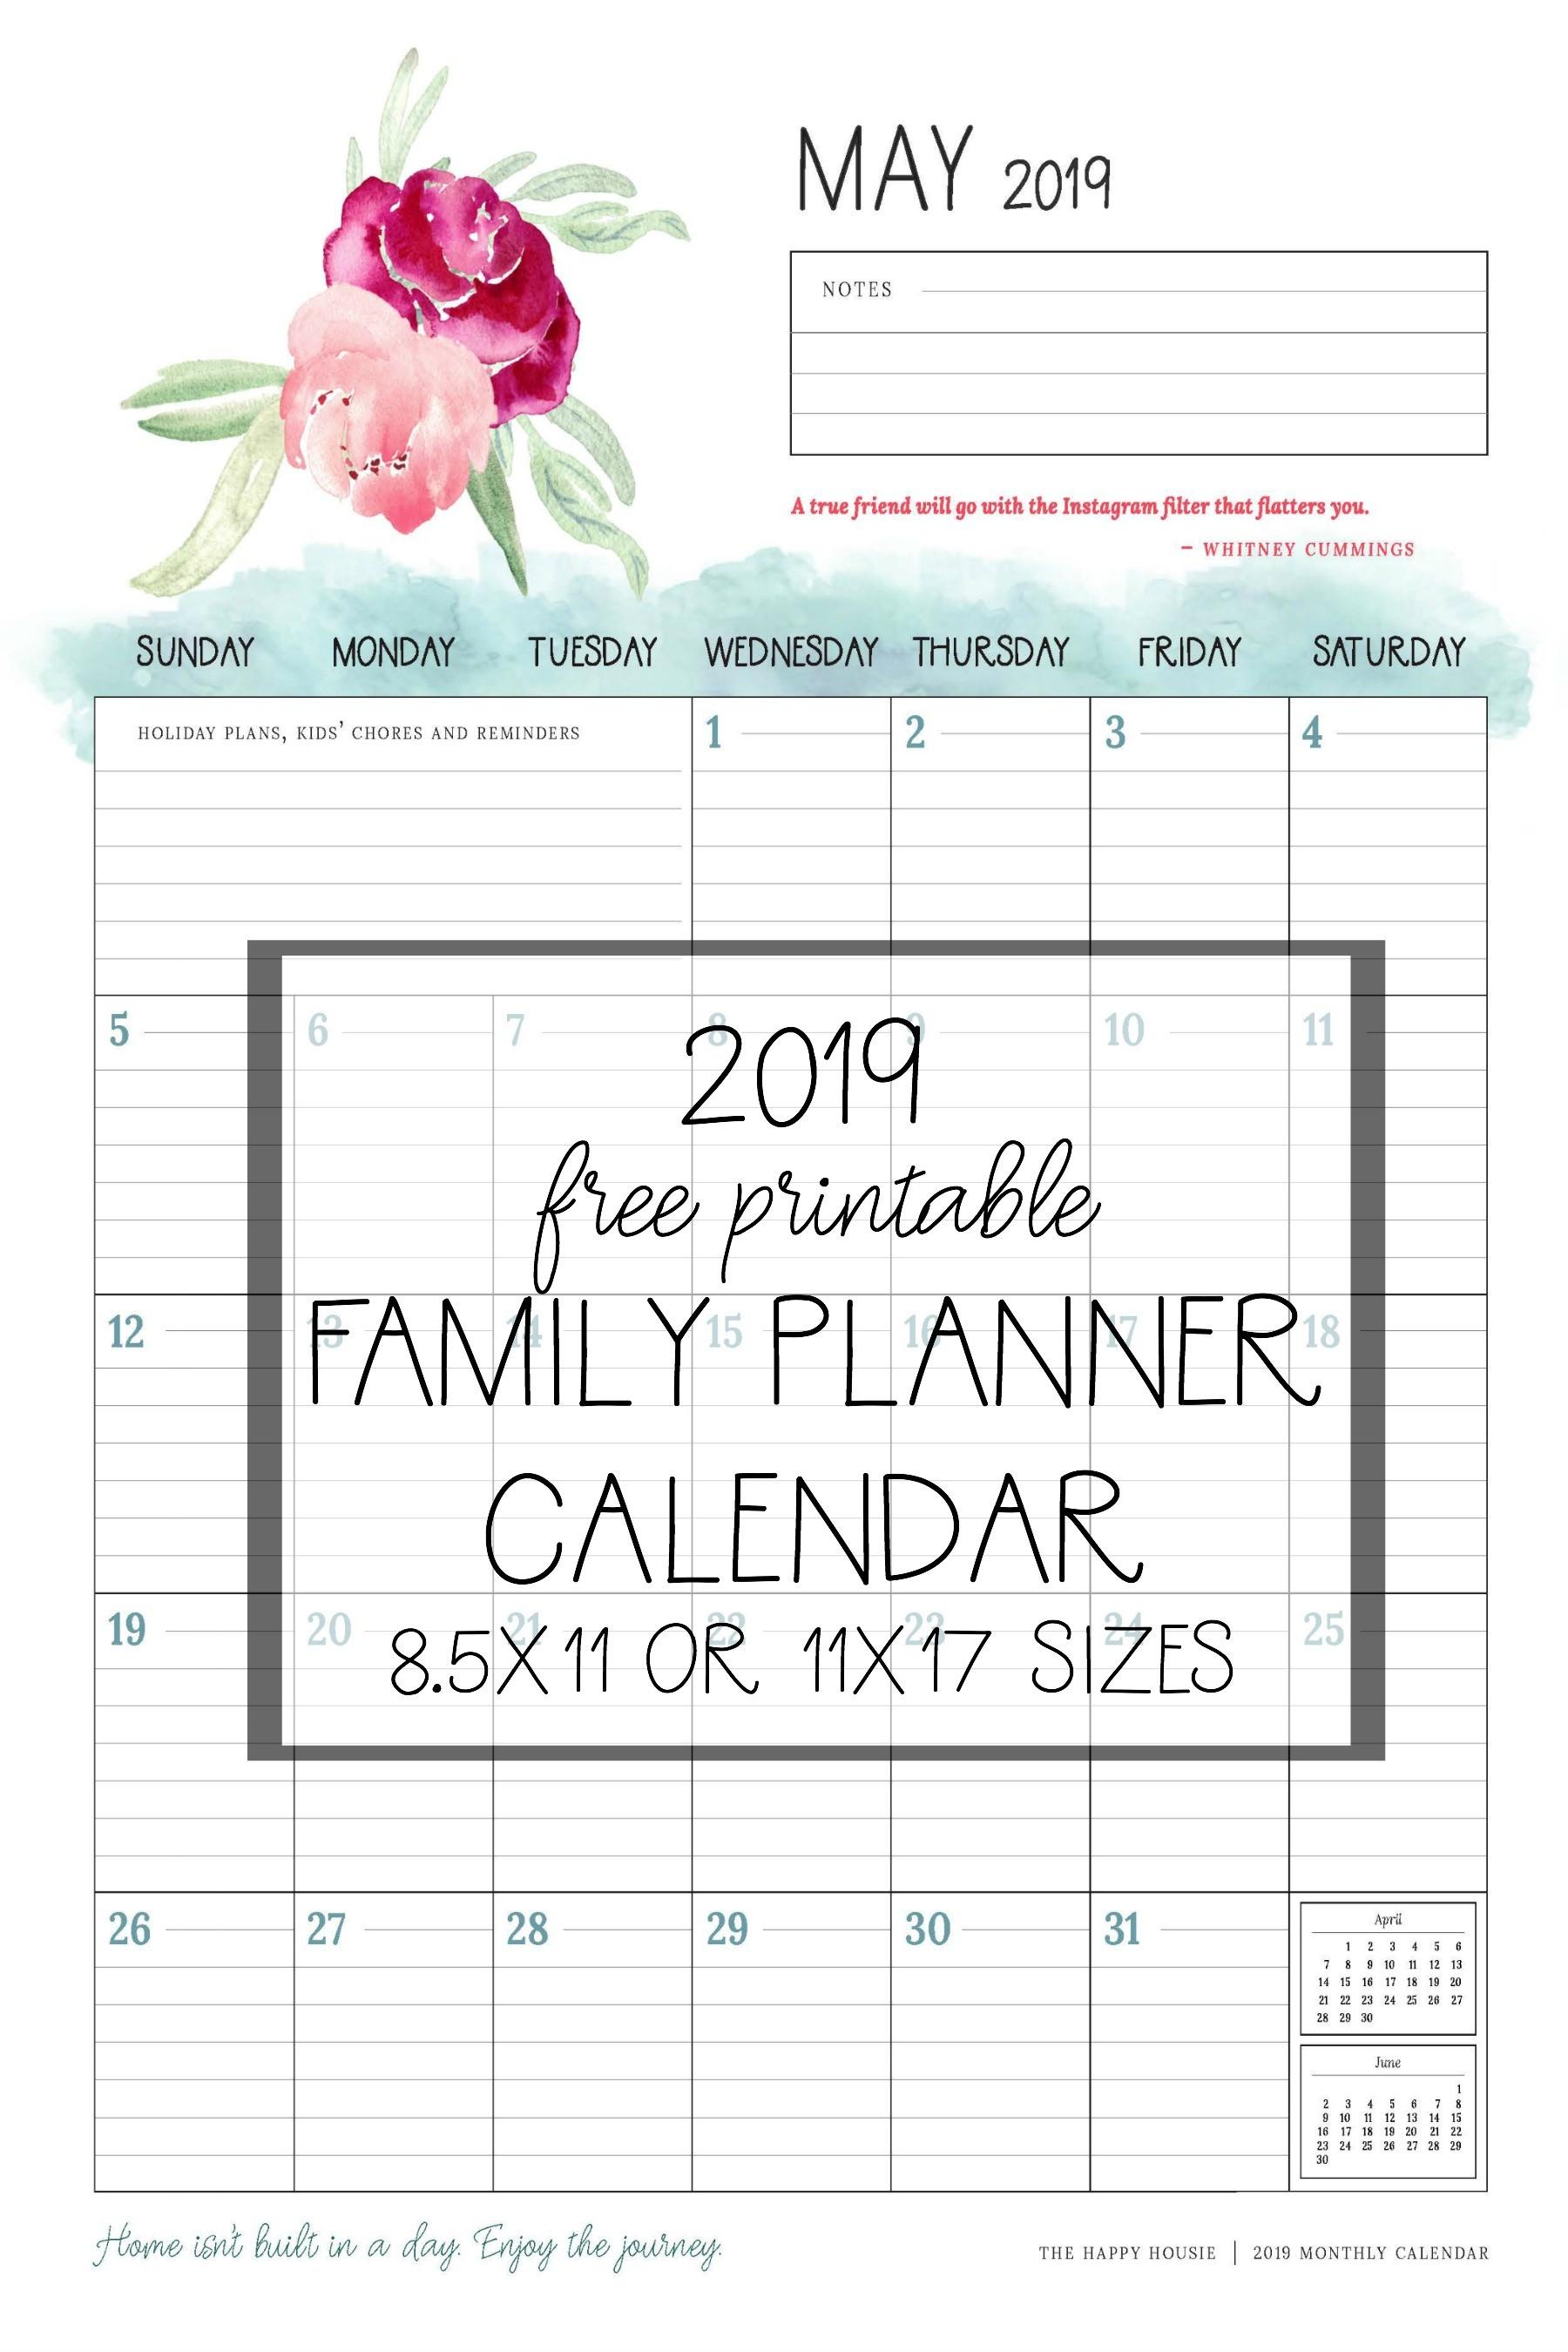 Free 2019 Printable Calendar Family Planner Organizer